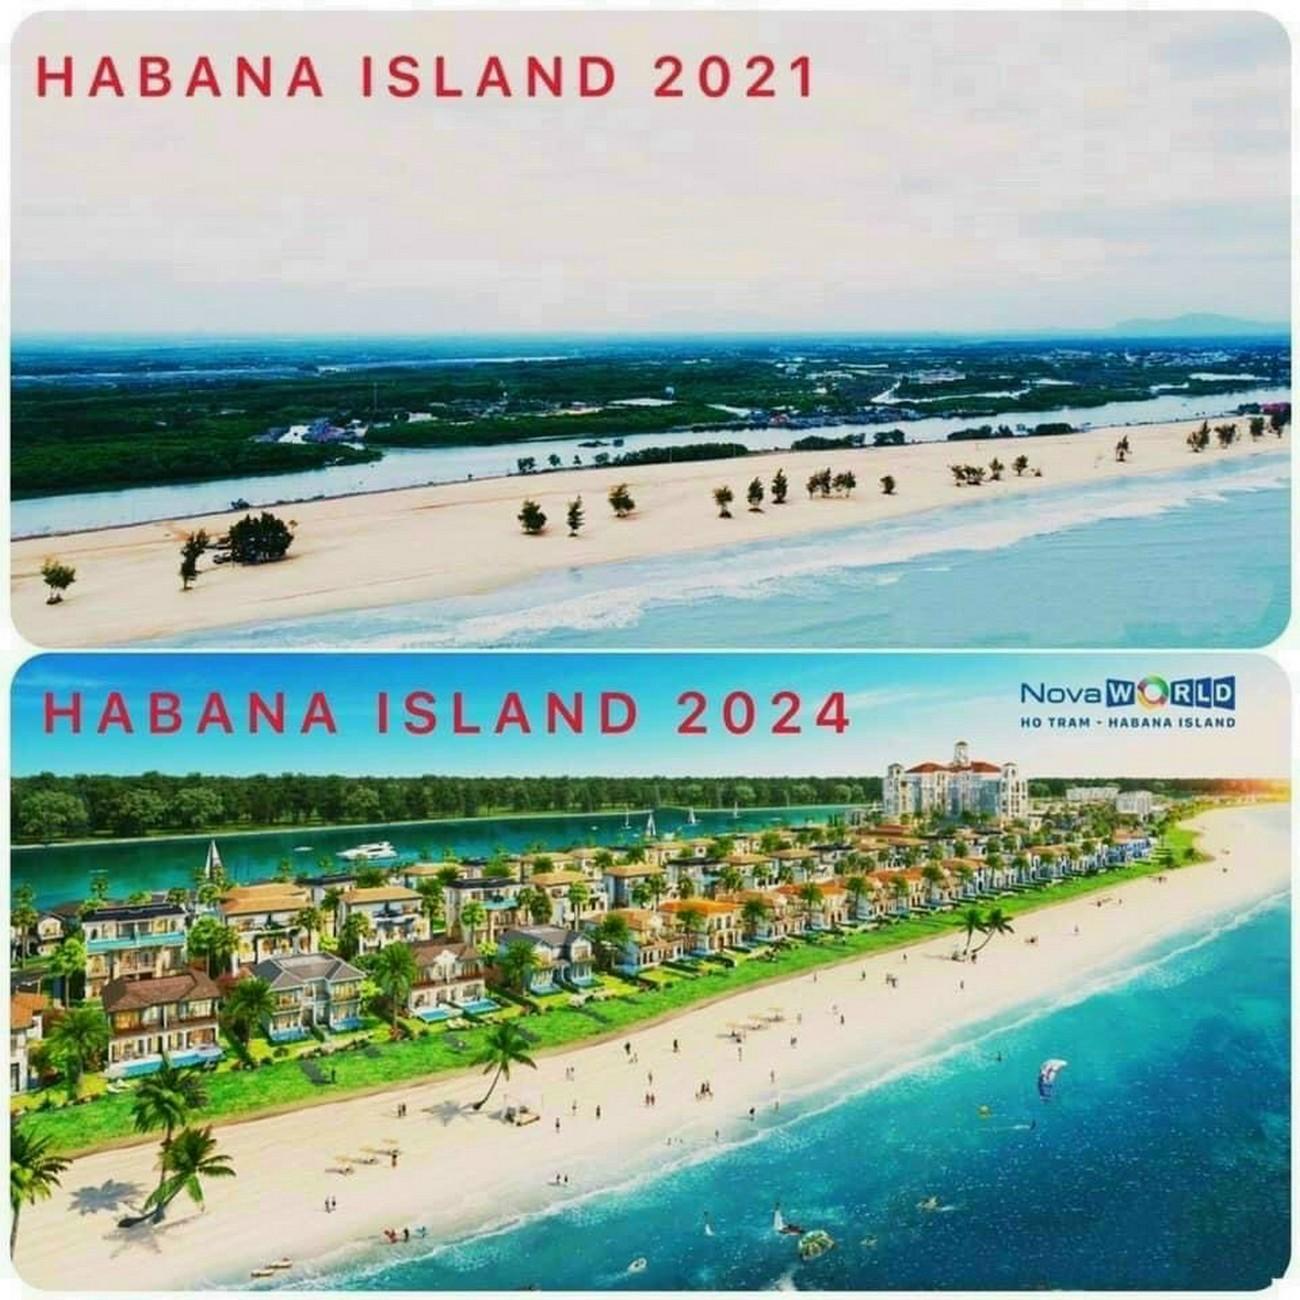 Habana island 2021 và Habana island 2024